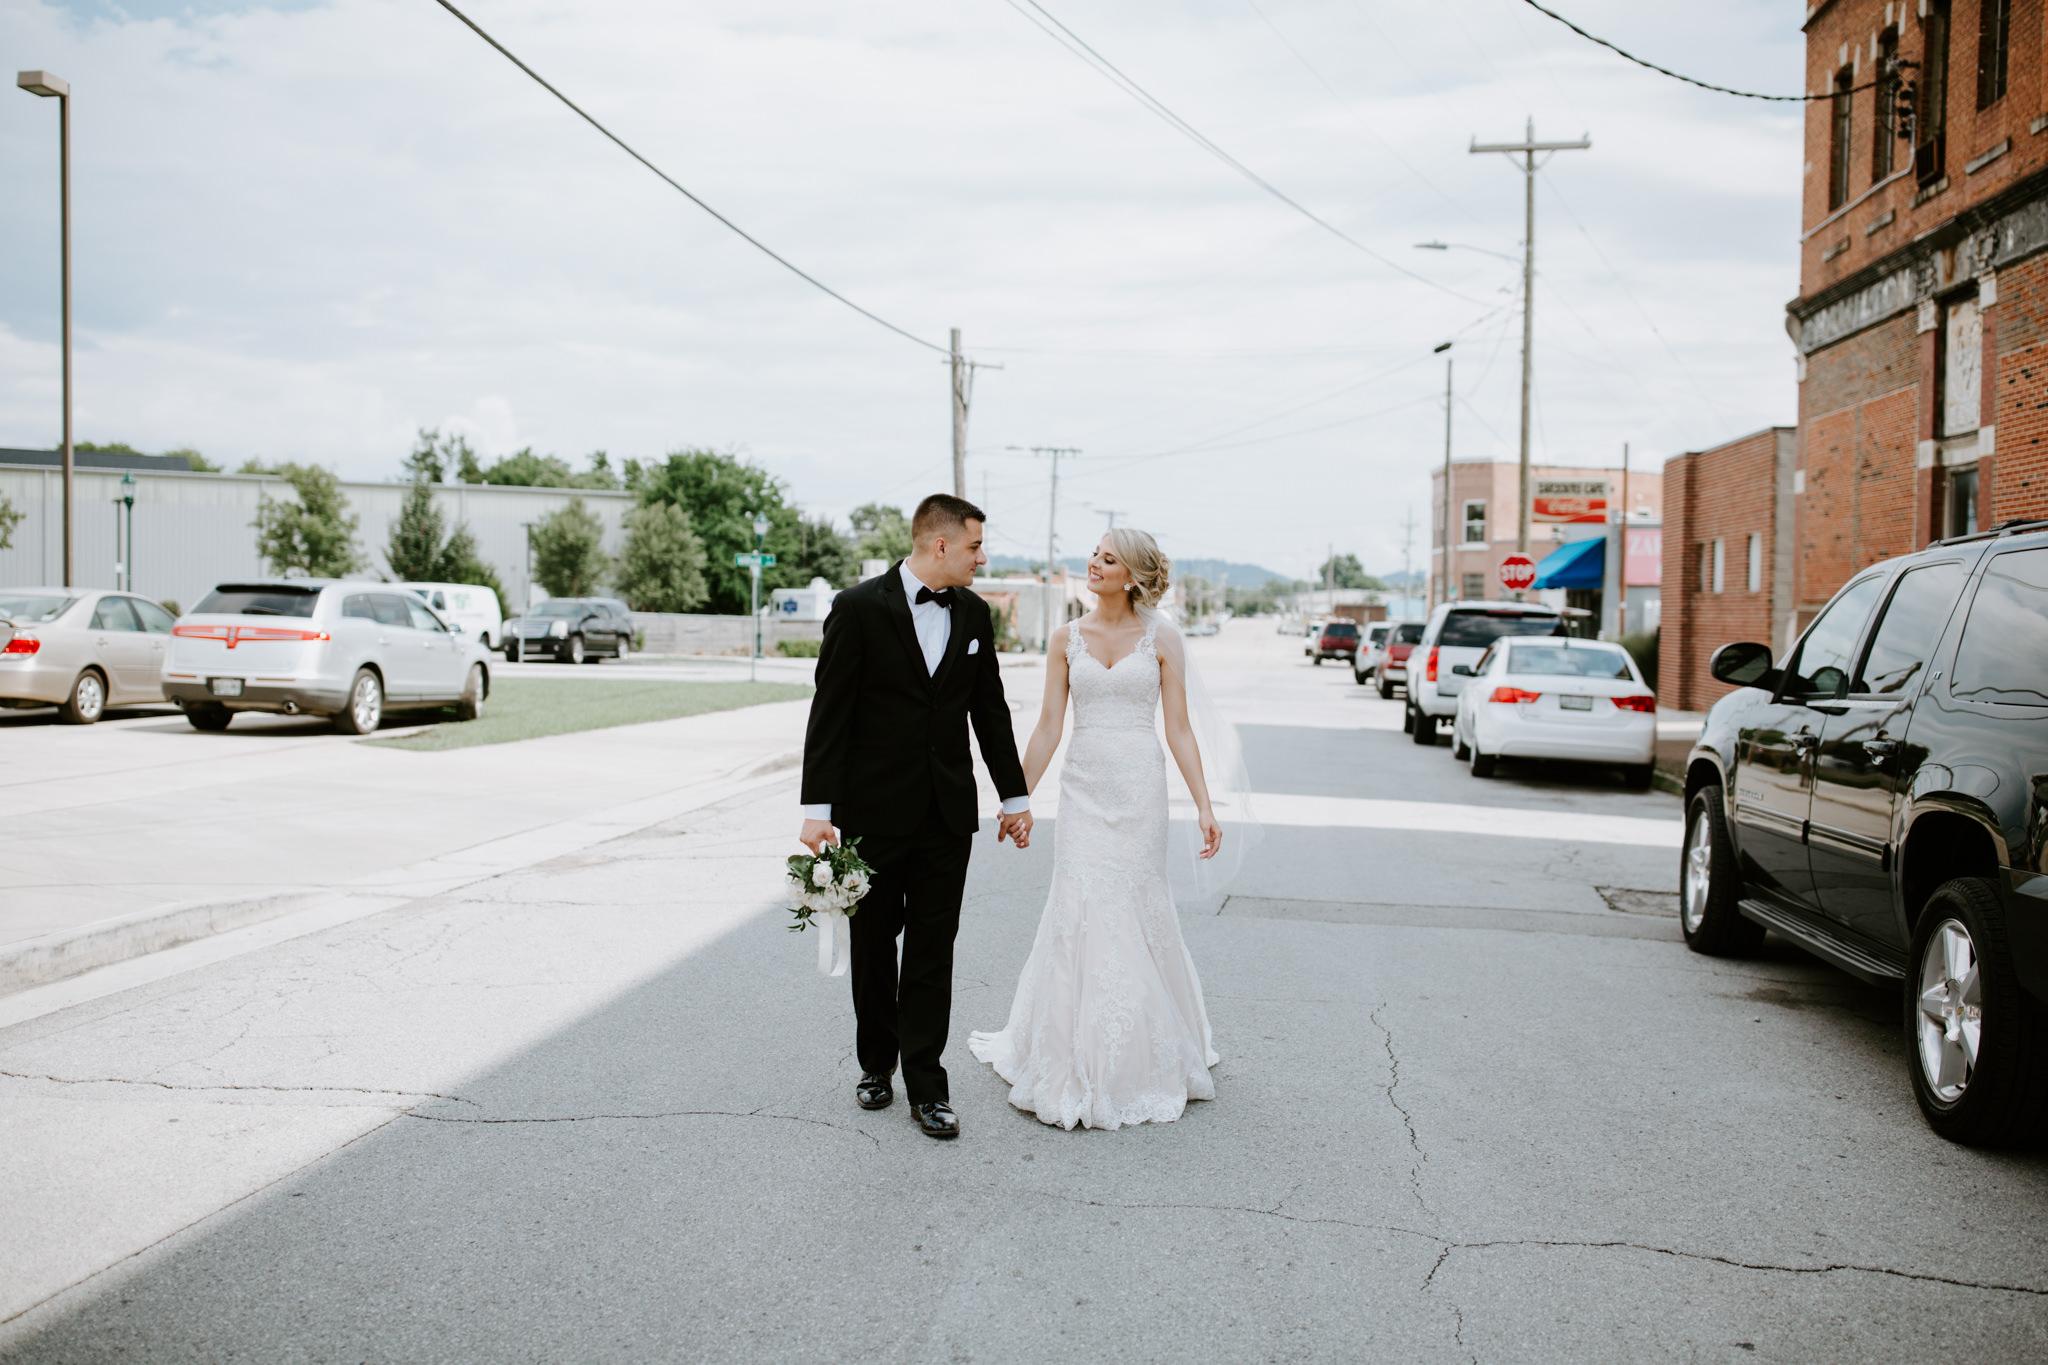 Kayley + Robert + Chattanooga + Nashville + Tennessee + Wedding-3-2.jpg